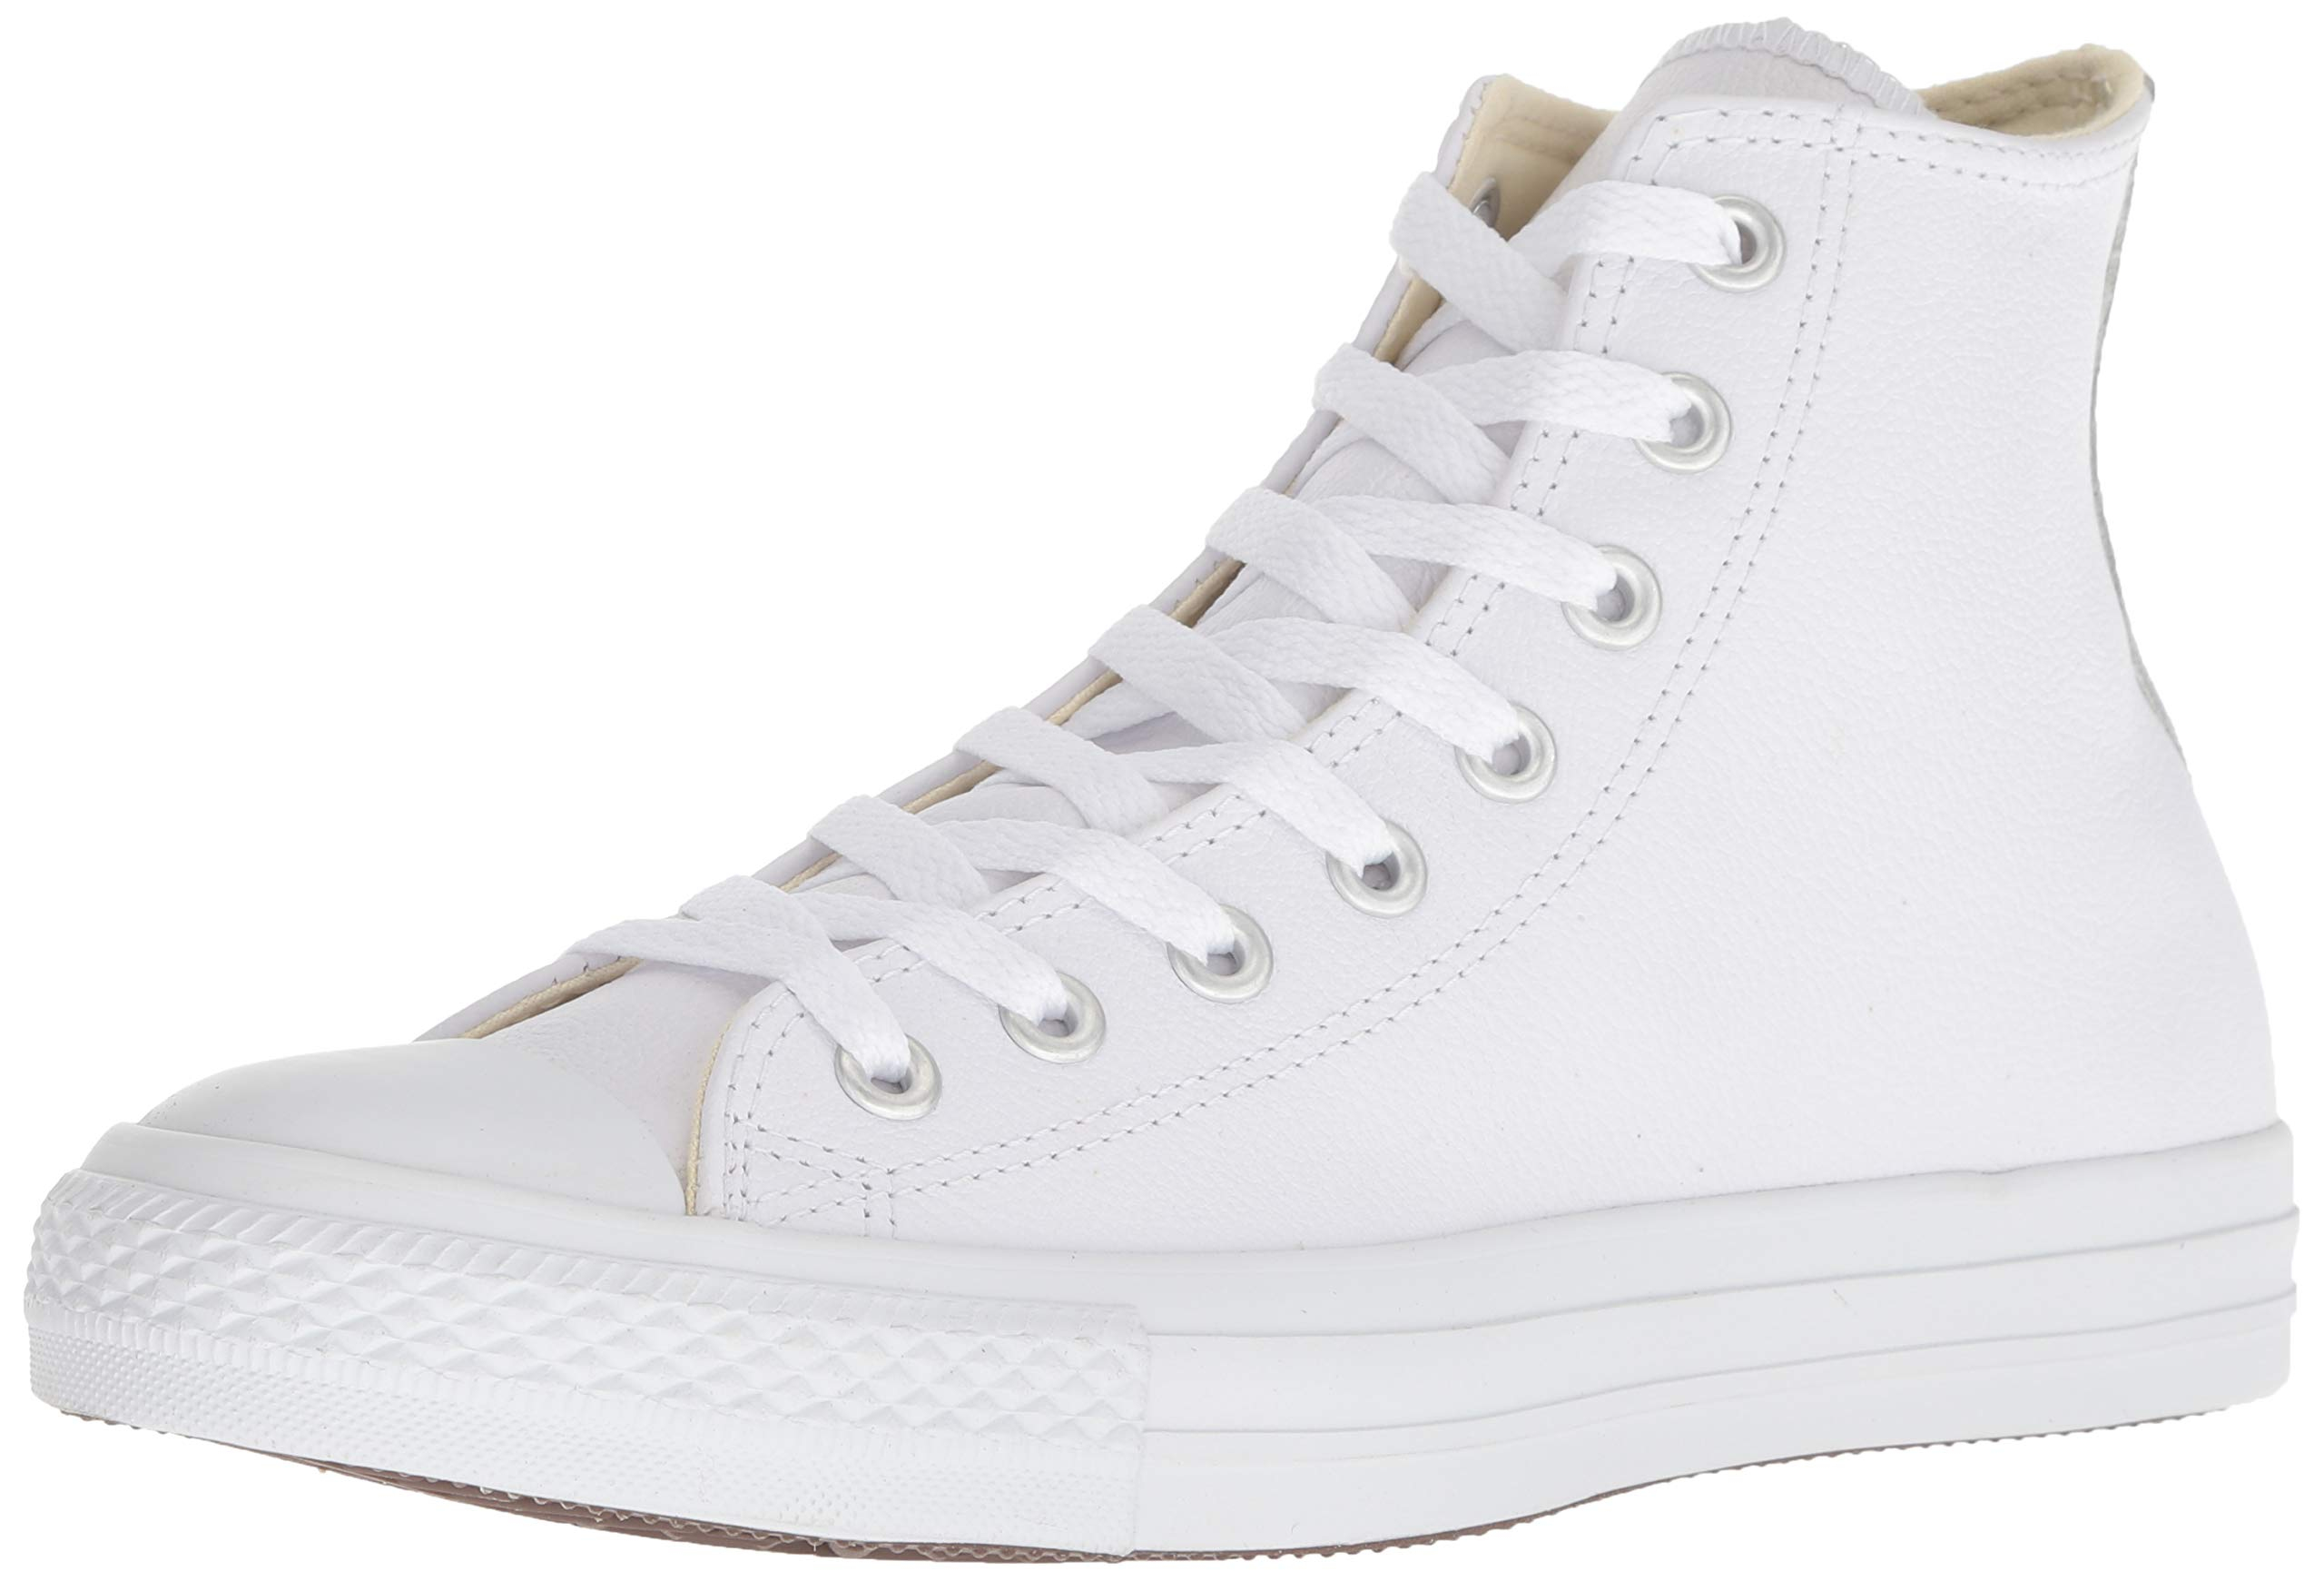 a5678d43d06c Galleon - Converse Chuck Taylor All Star Leather Hi